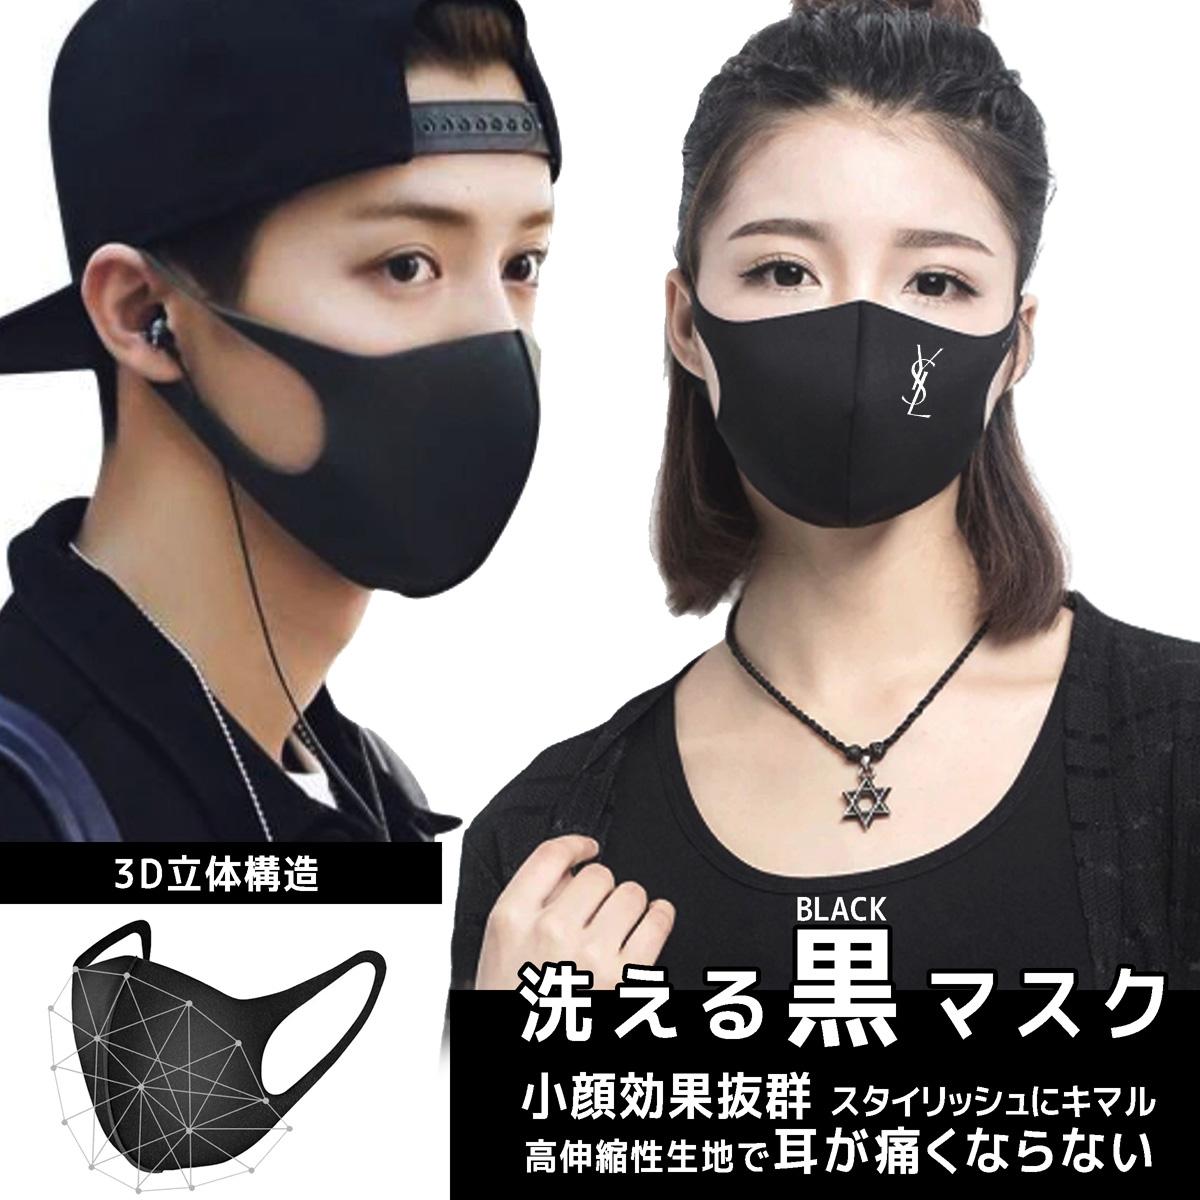 Luxury Brand YSL 3D Reusable Washable Soft Cotton Facemasks